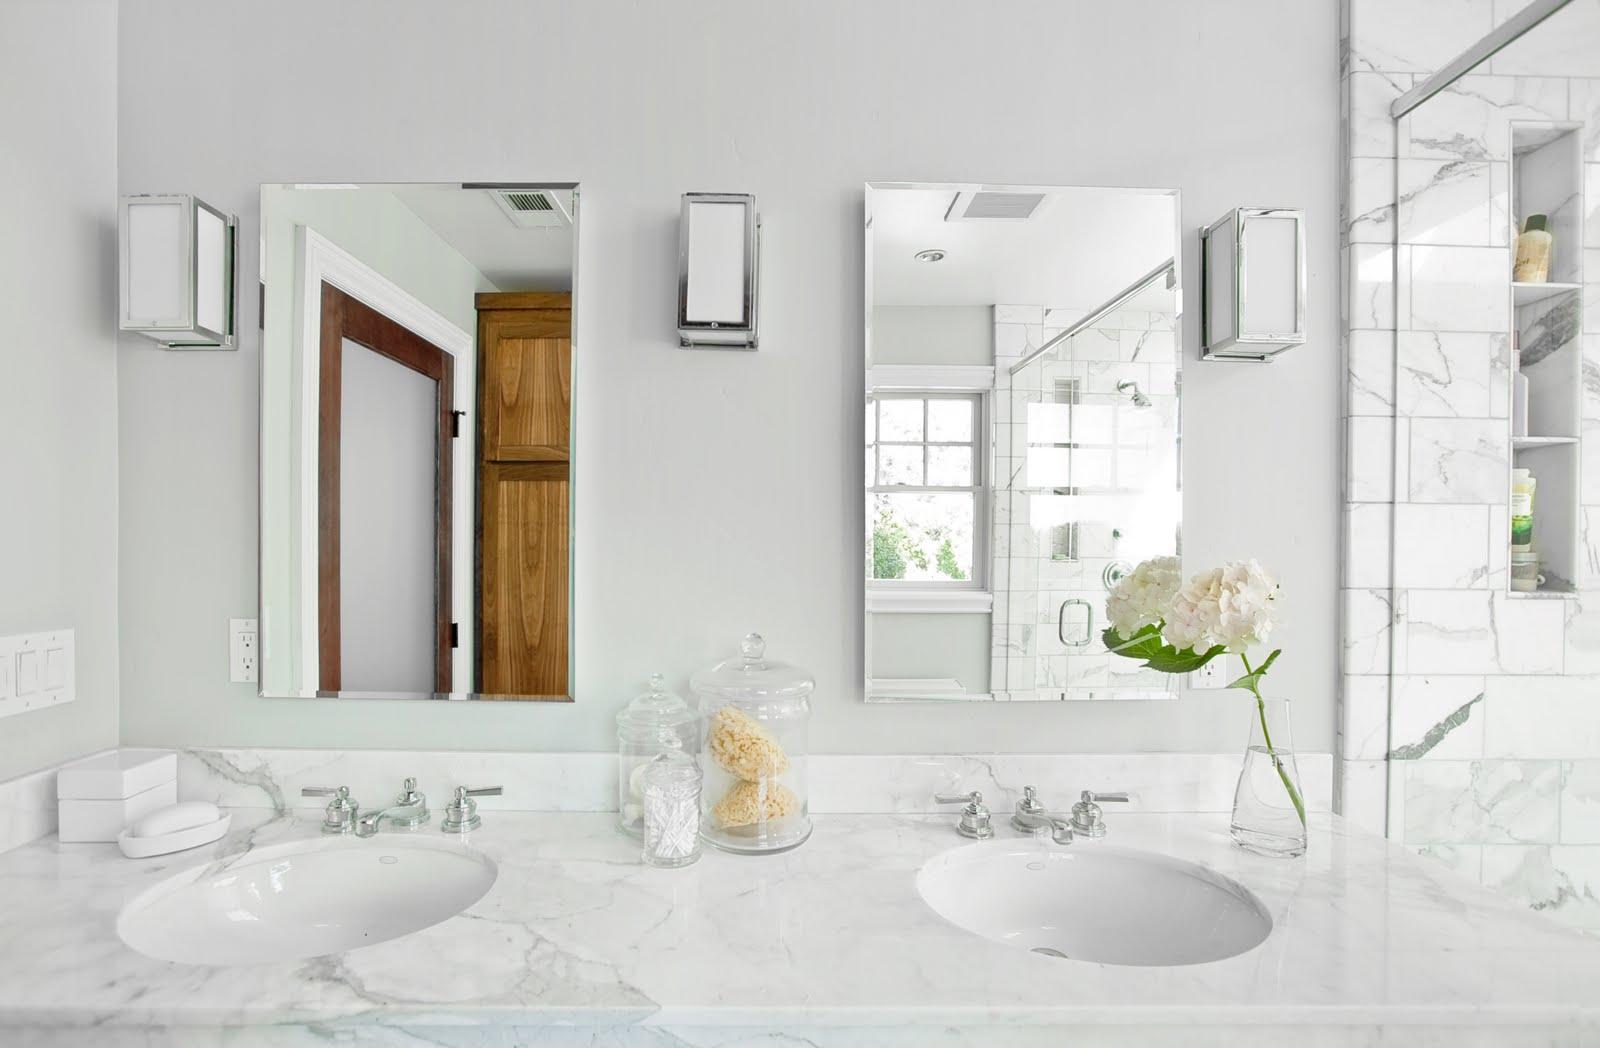 Bath Vanity Mirrors The George At 42